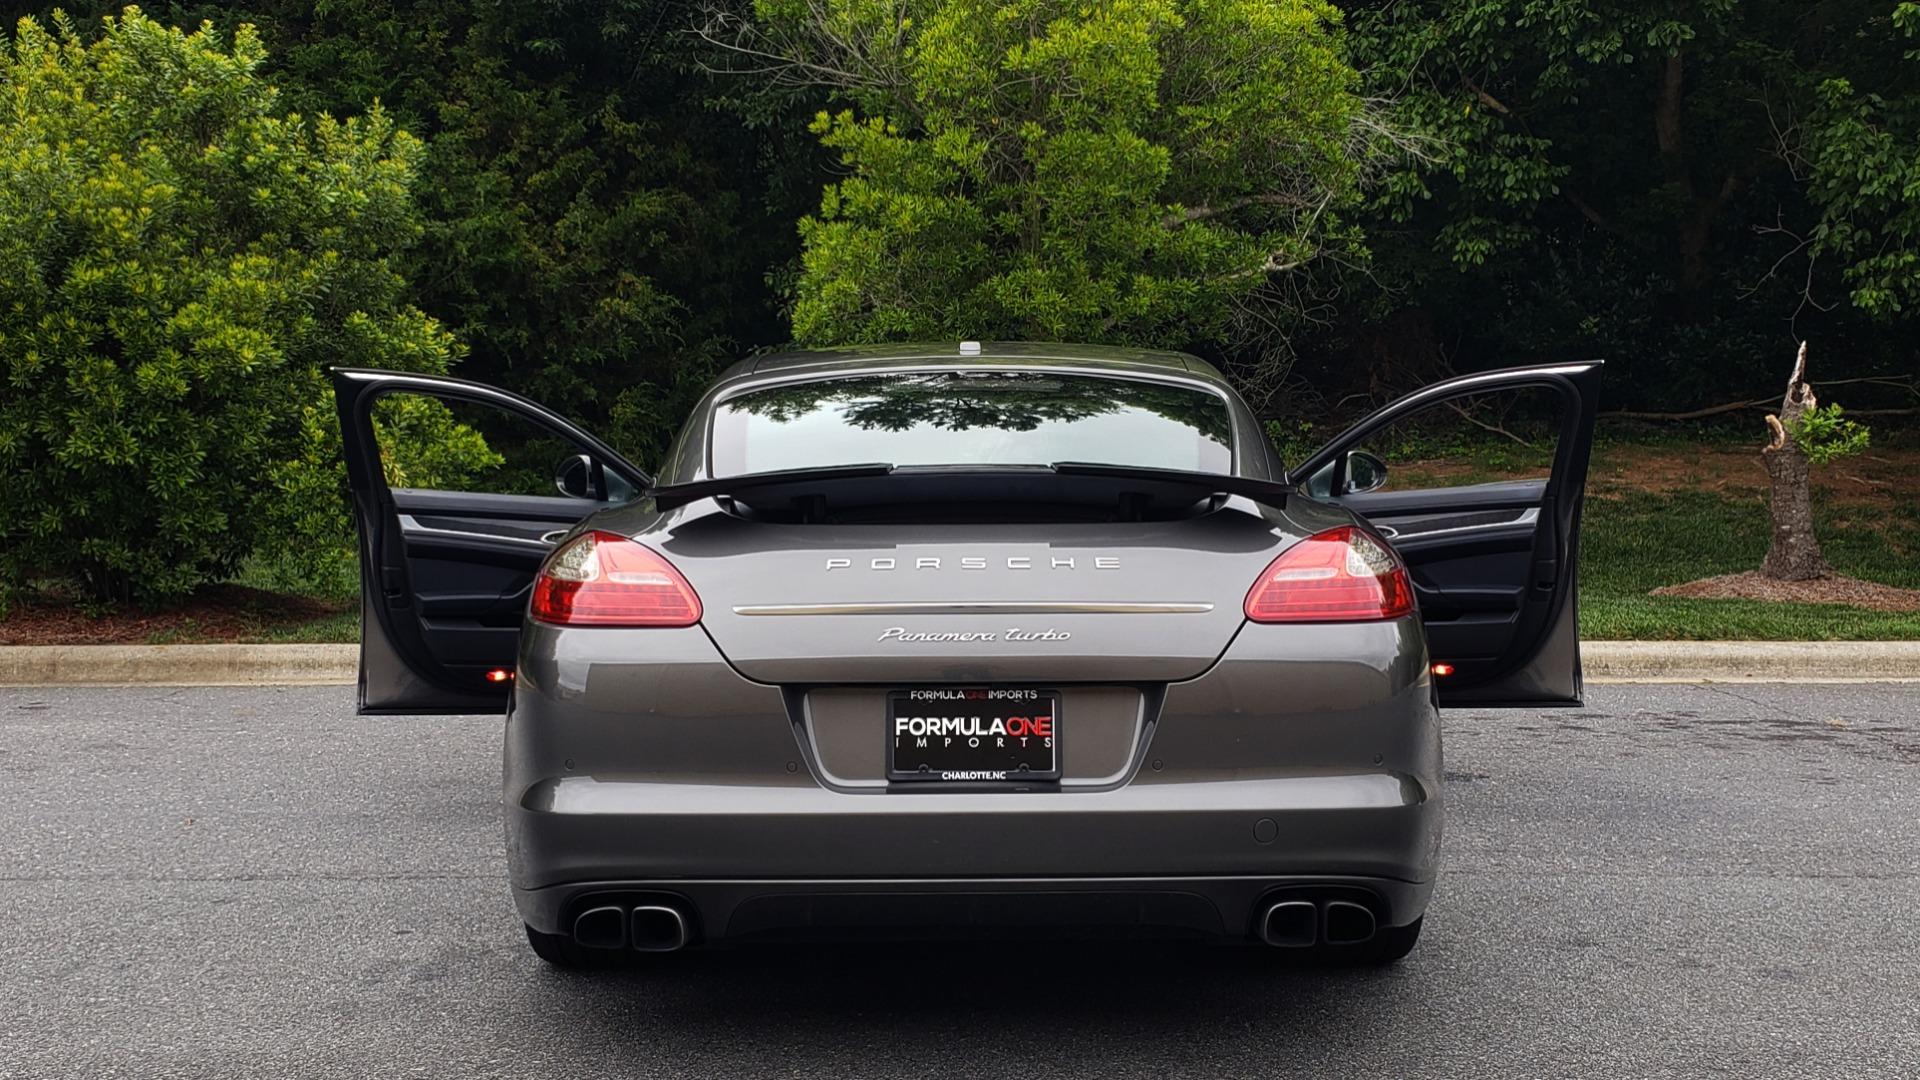 Used 2013 Porsche PANAMERA TURBO 4.8L V8 / AWD / NAV / SUNROOF / LCA / PARK ASST / BURMESTER for sale $45,995 at Formula Imports in Charlotte NC 28227 25